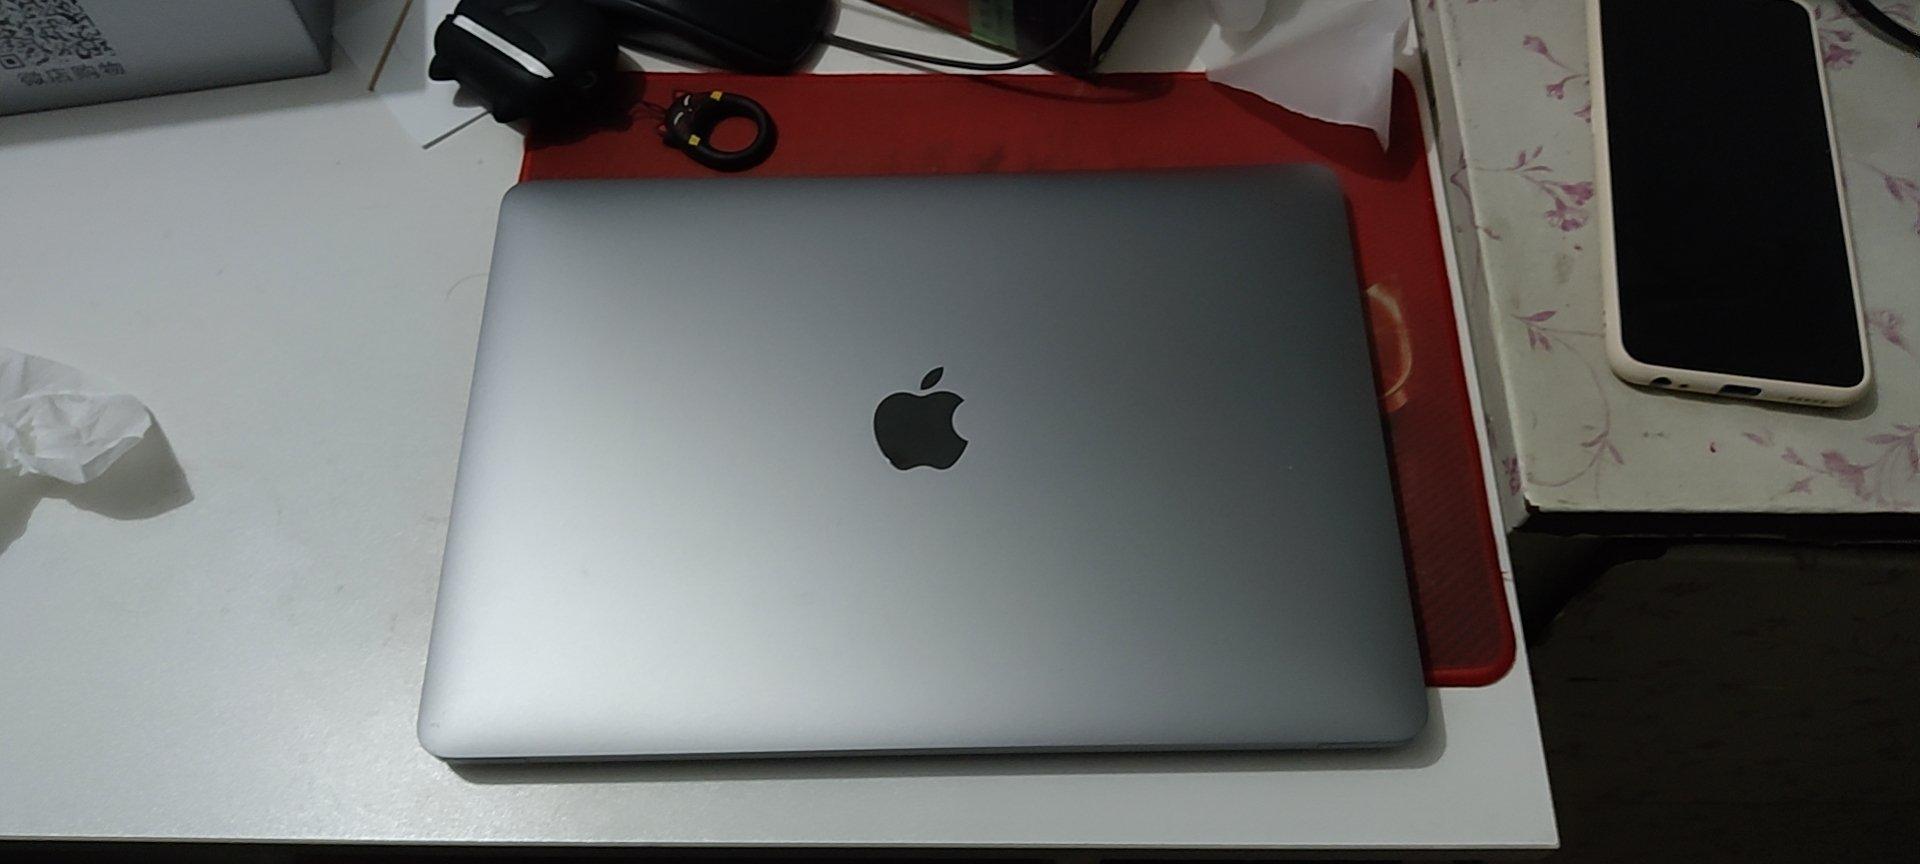 MacBook Pro笔记本电脑,M1芯片能安静办公了